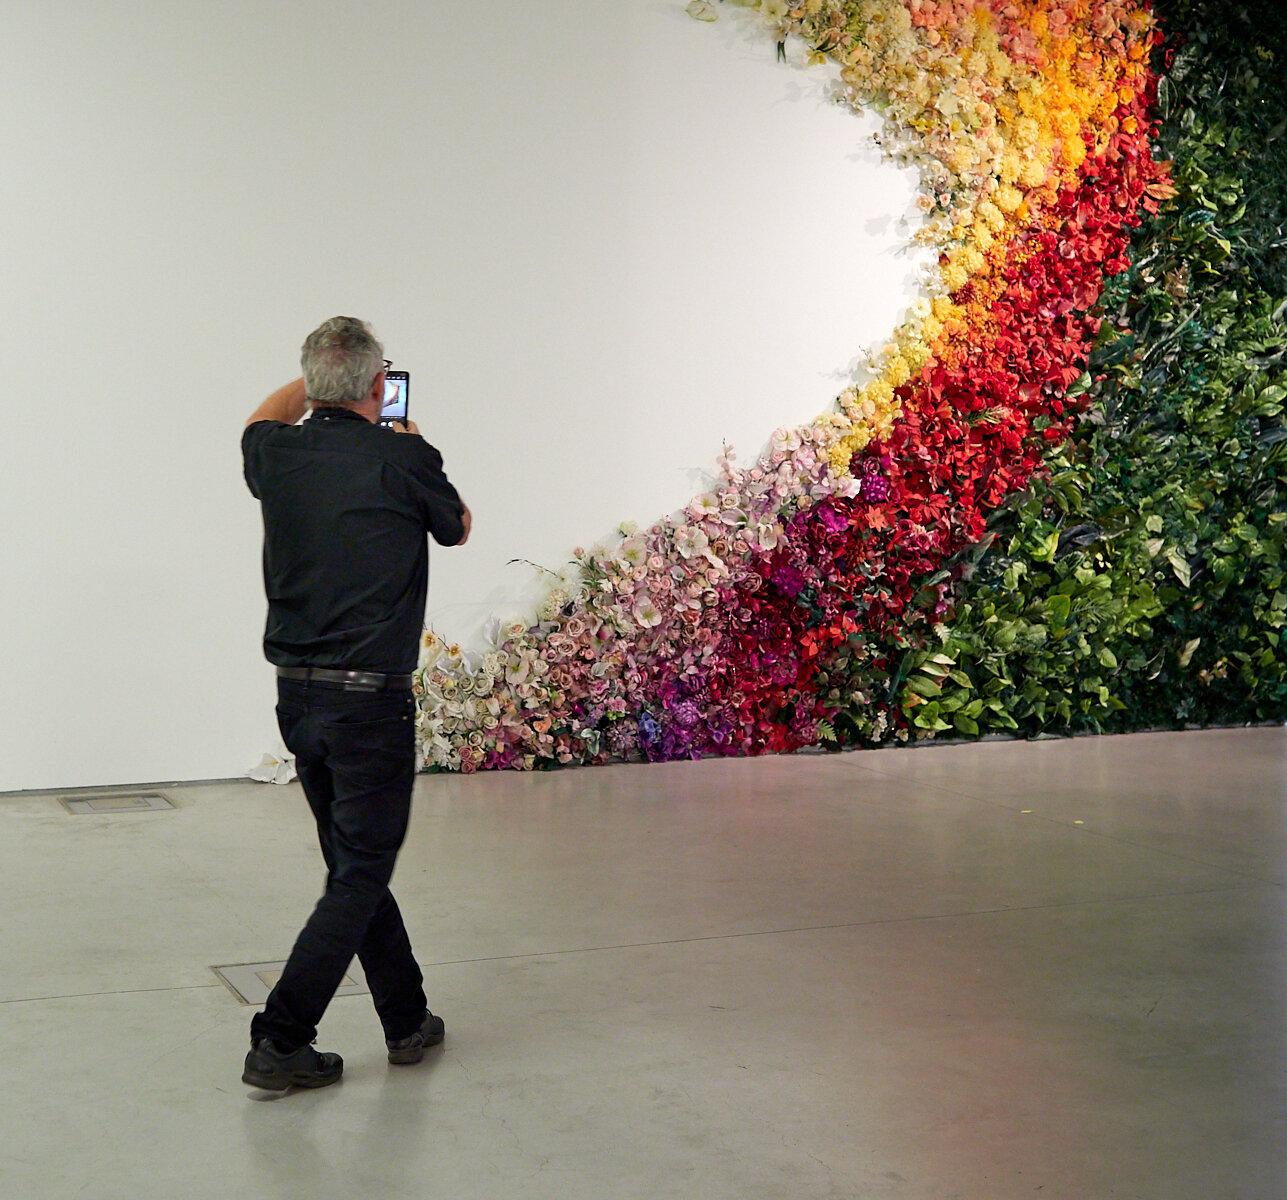 Museum of Contemporary Art blooms 1600x1200 sRGB.jpg